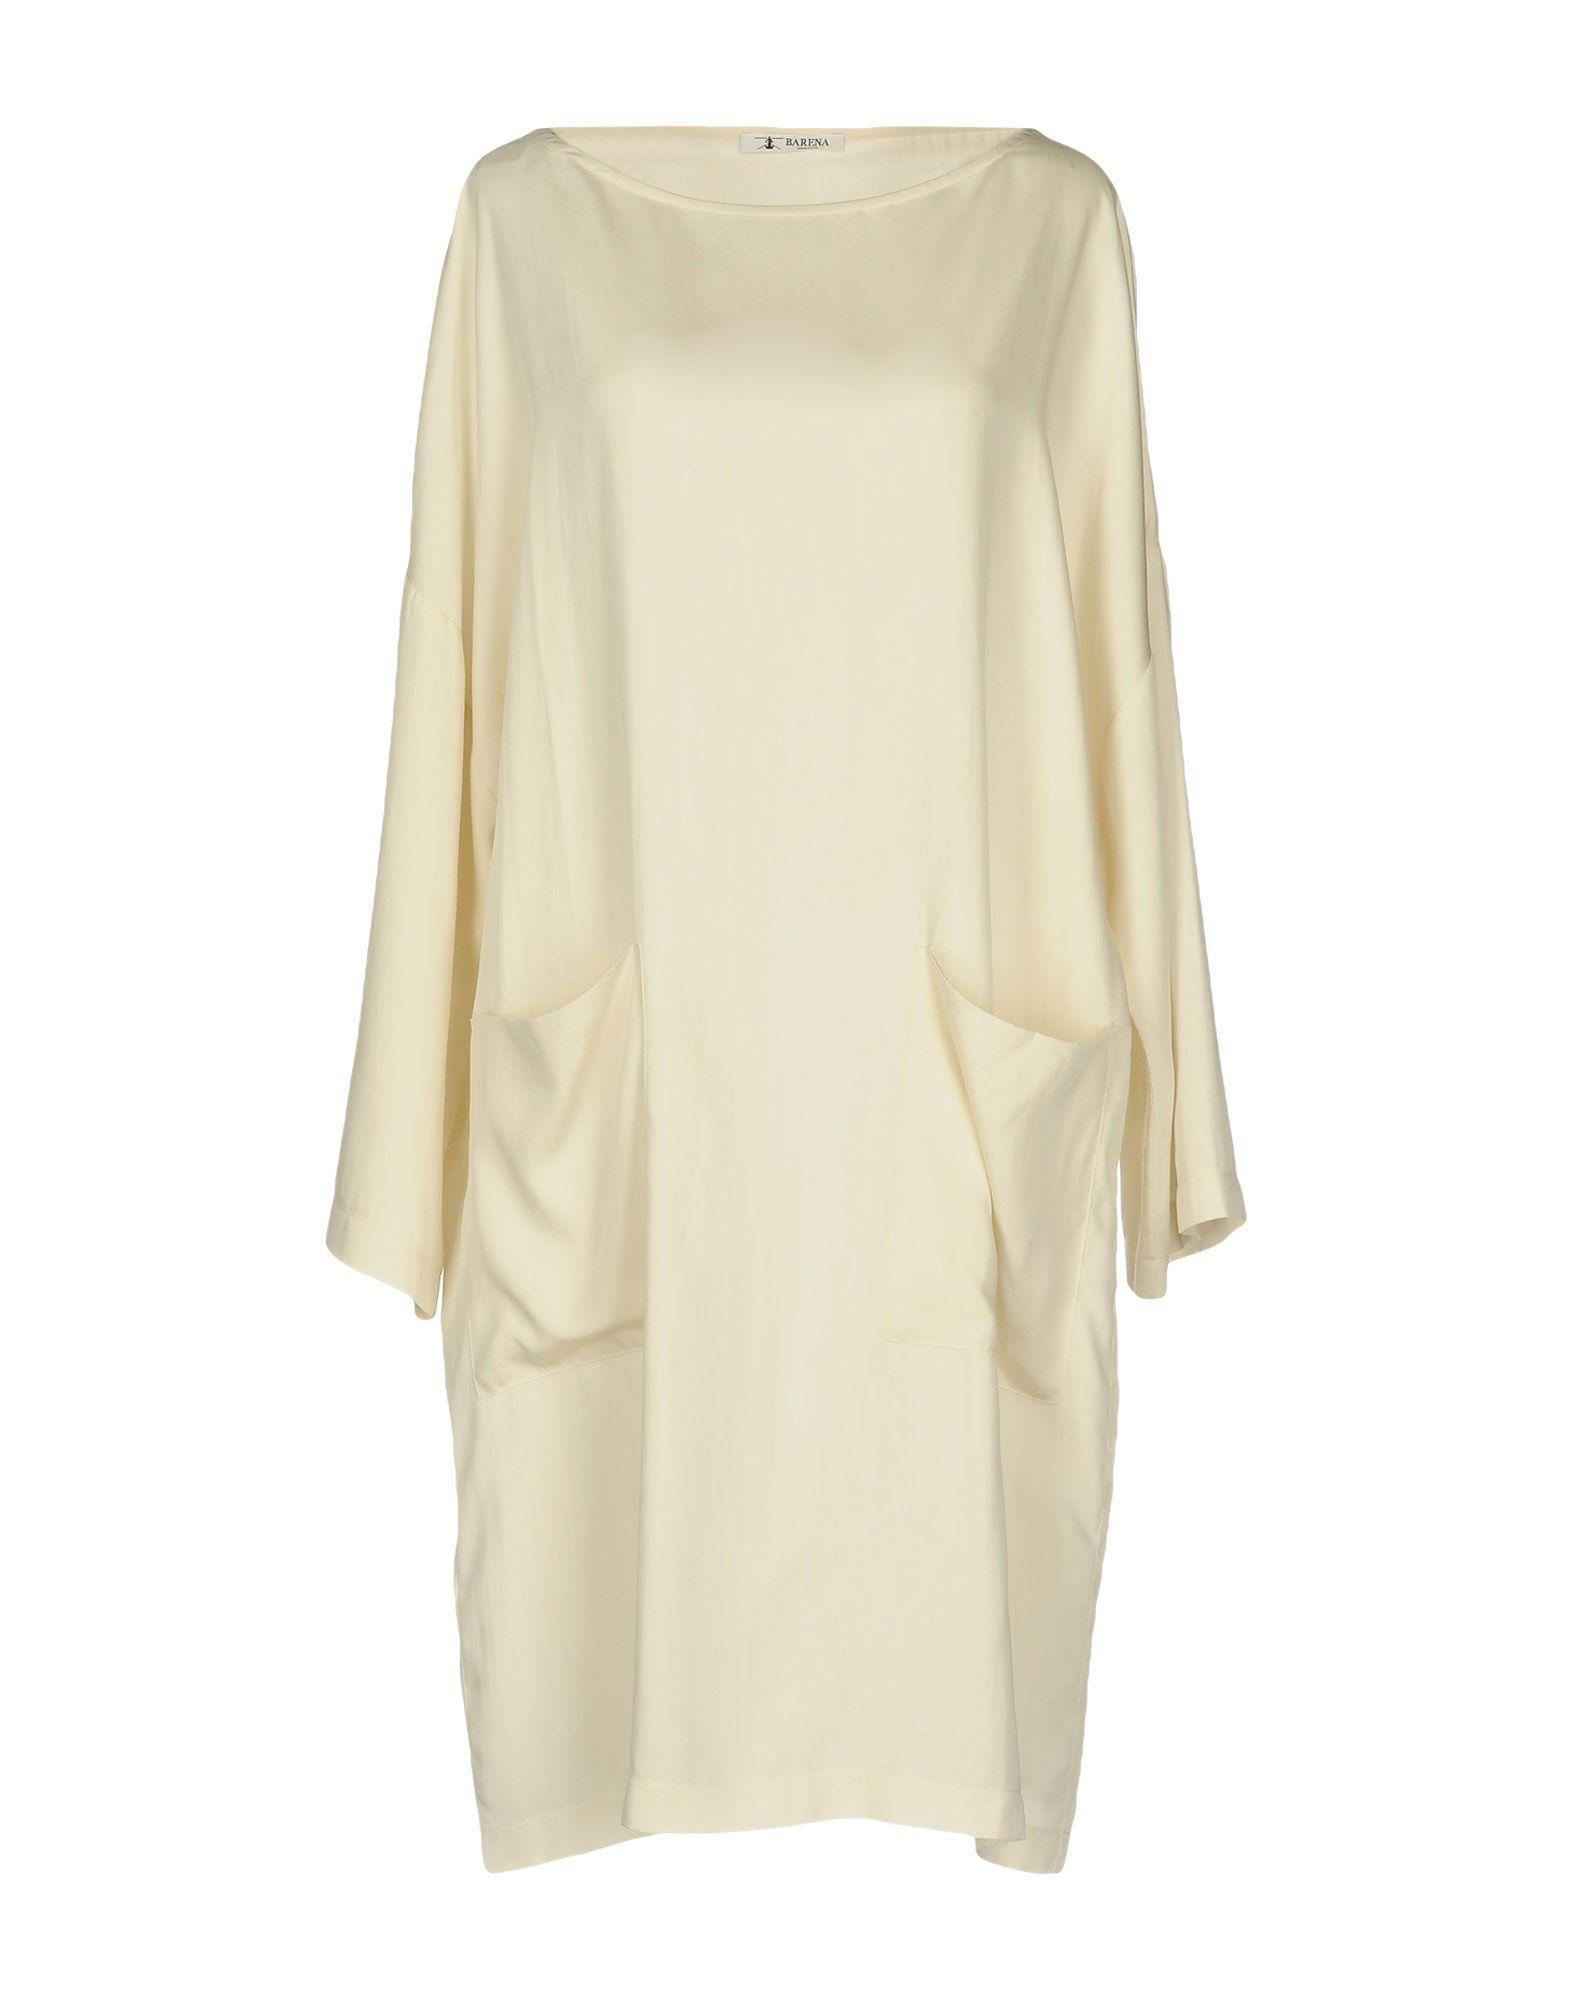 Barena Venezia Short Dresses In Ivory